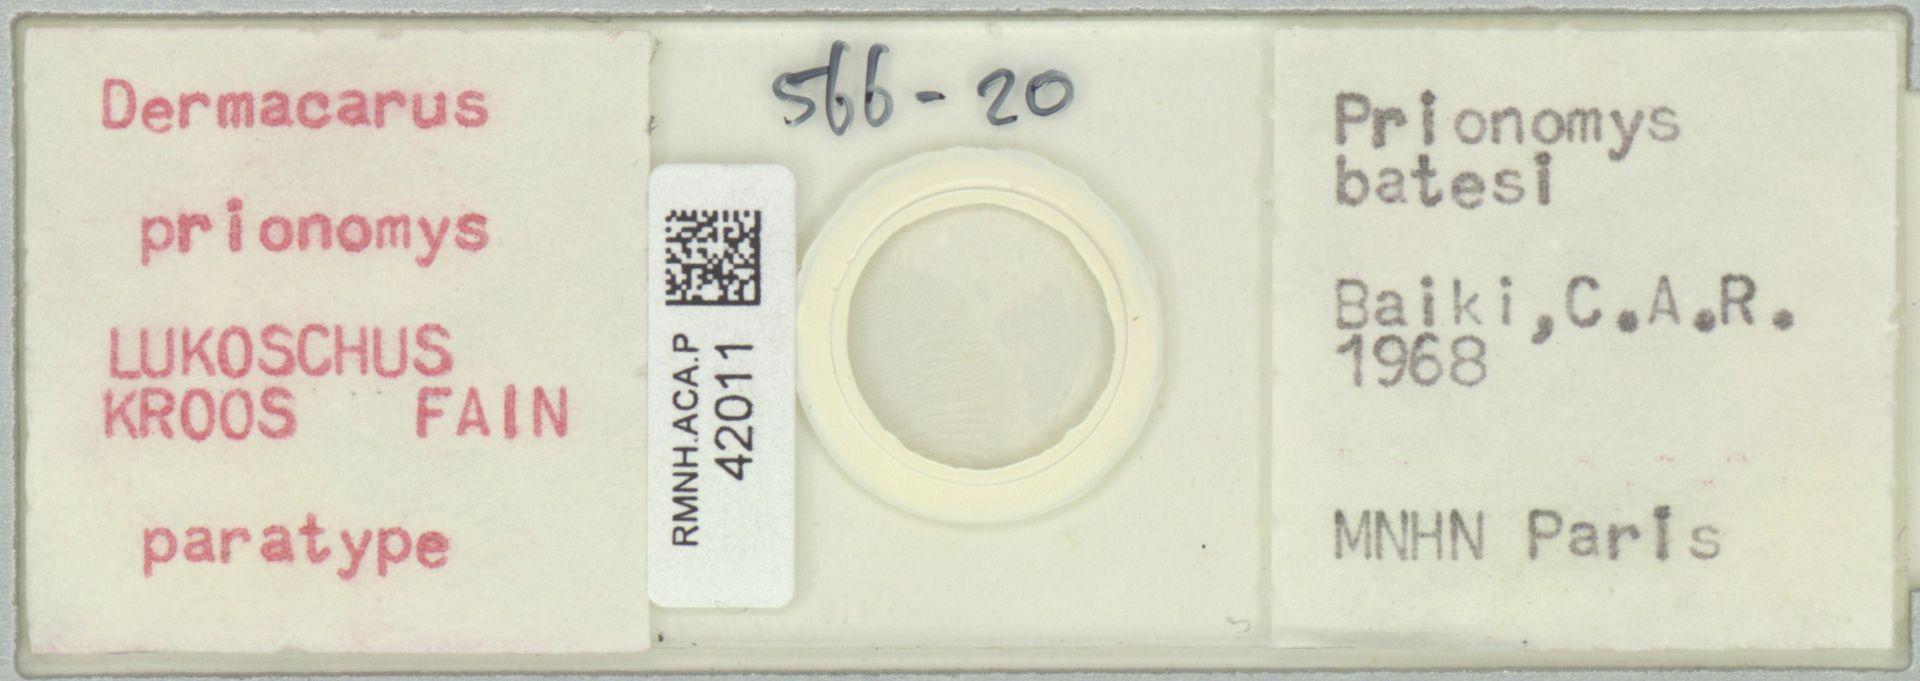 RMNH.ACA.P.42011 | Dermacarus prionomys Lukoschus Kroos Fain